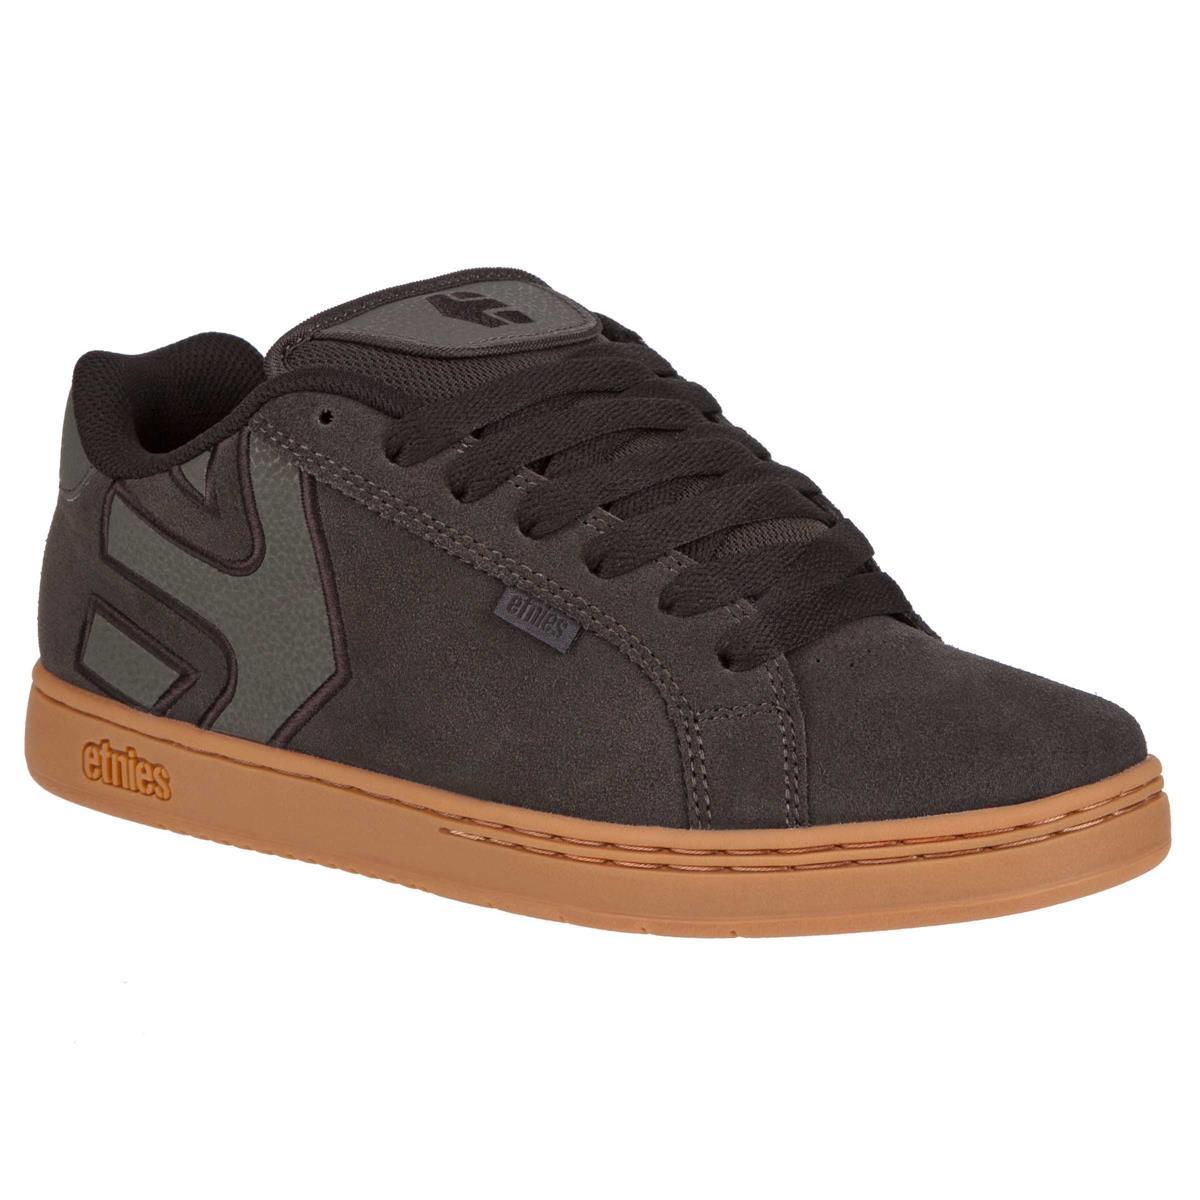 Etnies Schuhe Fader Charcoal